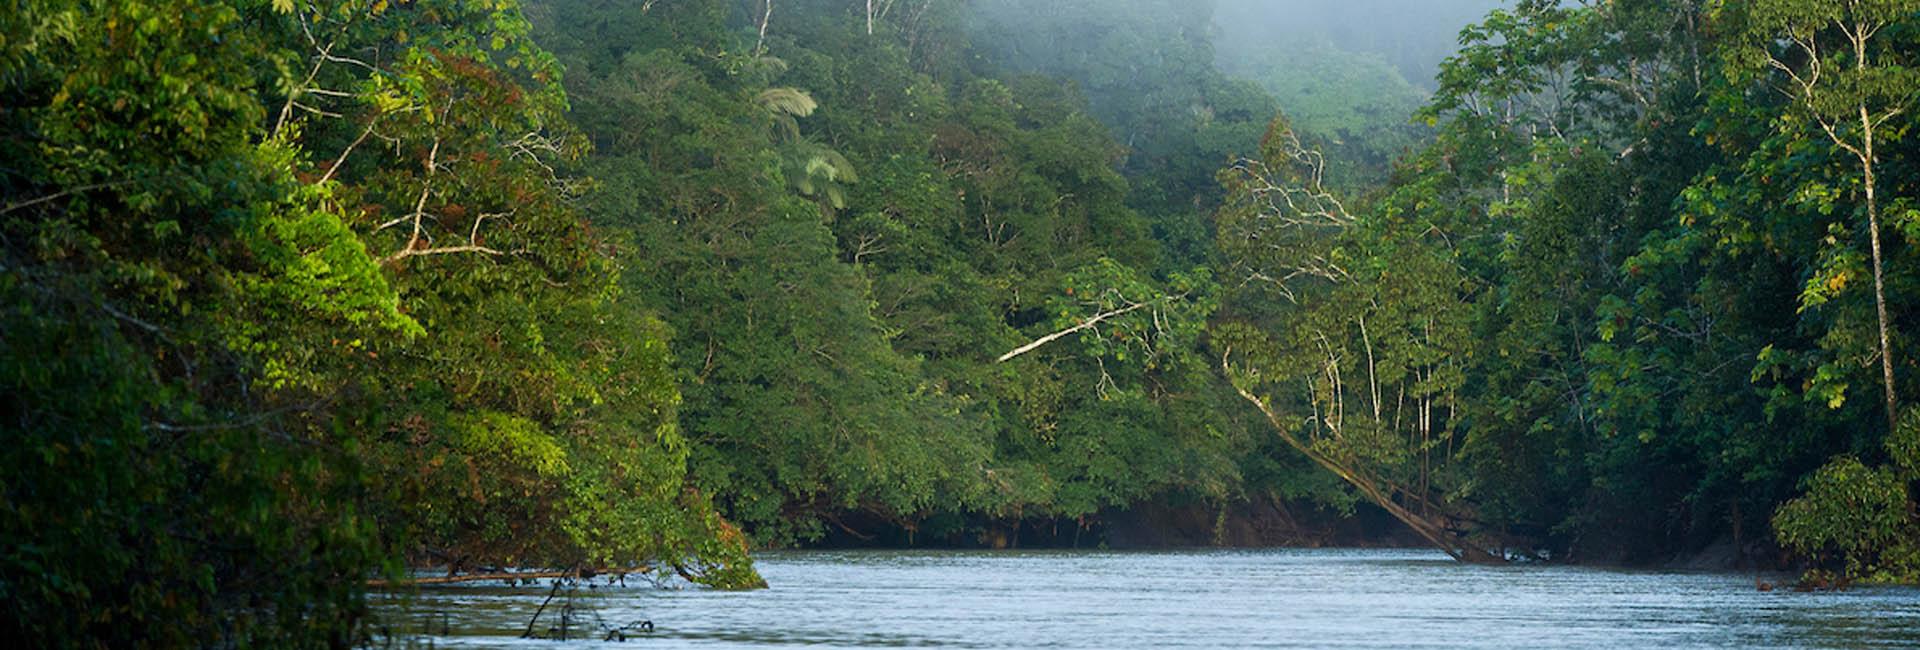 Tiputini River in the Ecuadorian Amazon